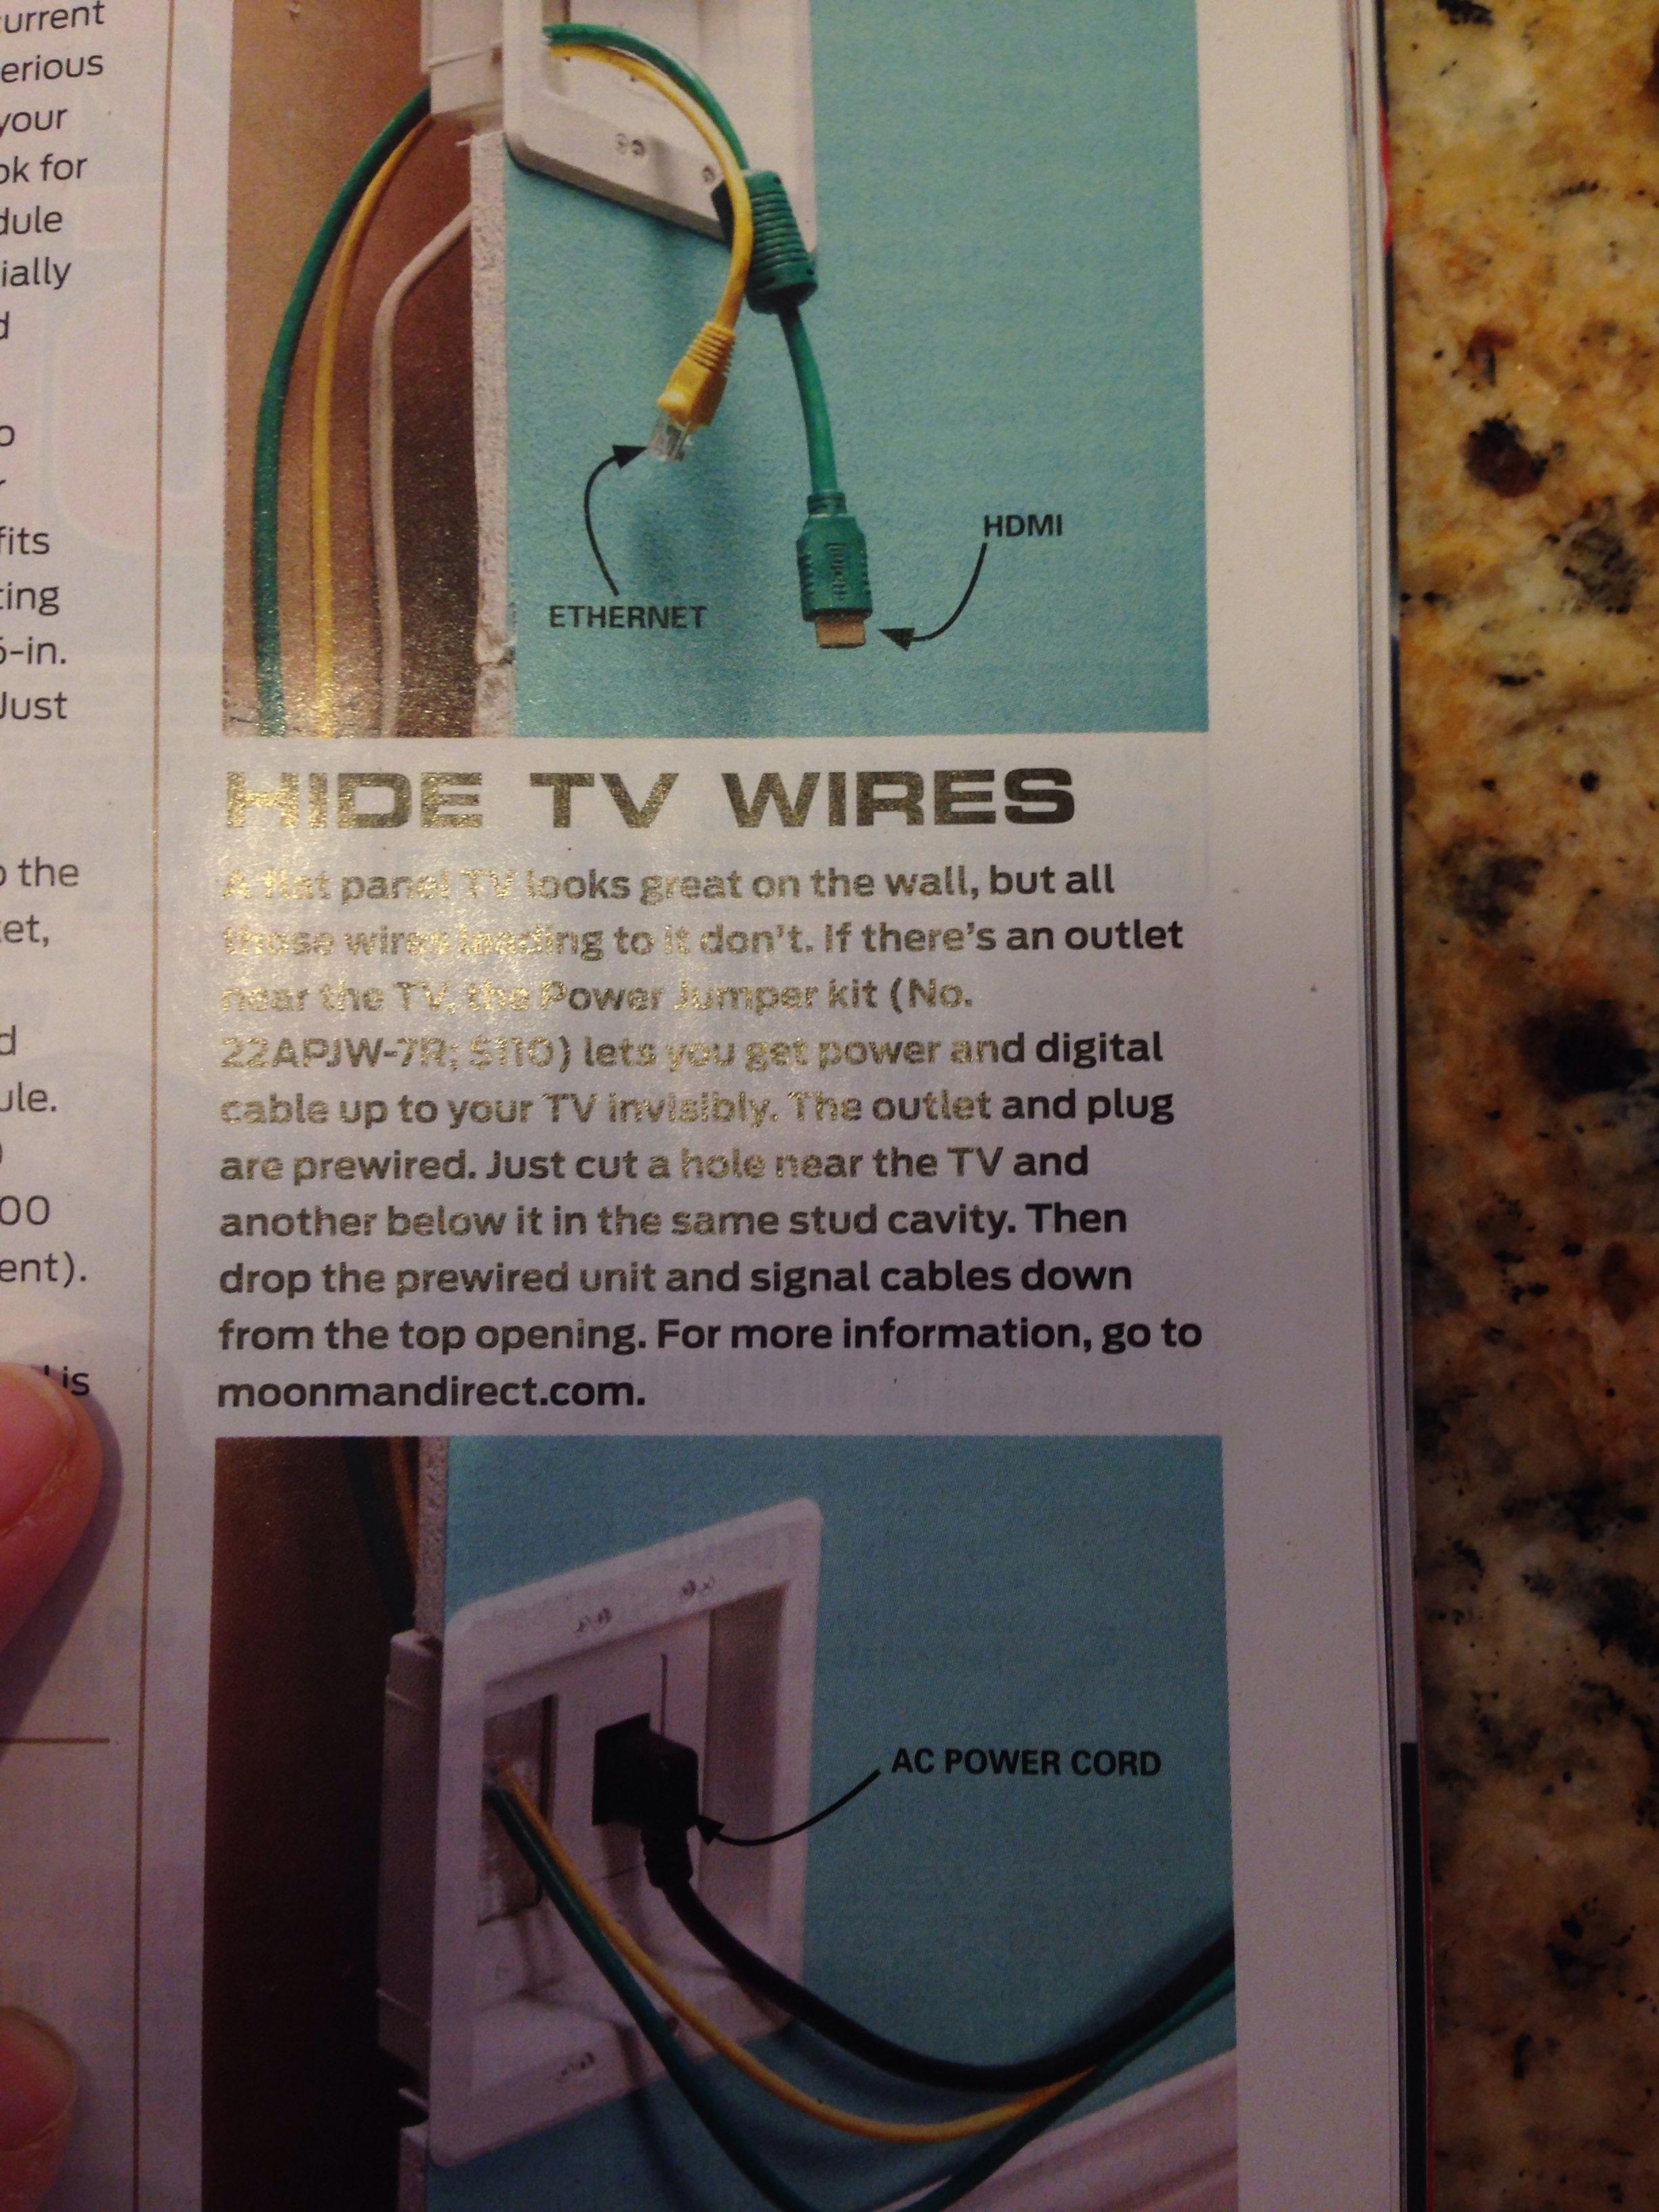 Hide Tv Wires Moonmandirectcom Tvwallmountideas Wall Mount Wiring In